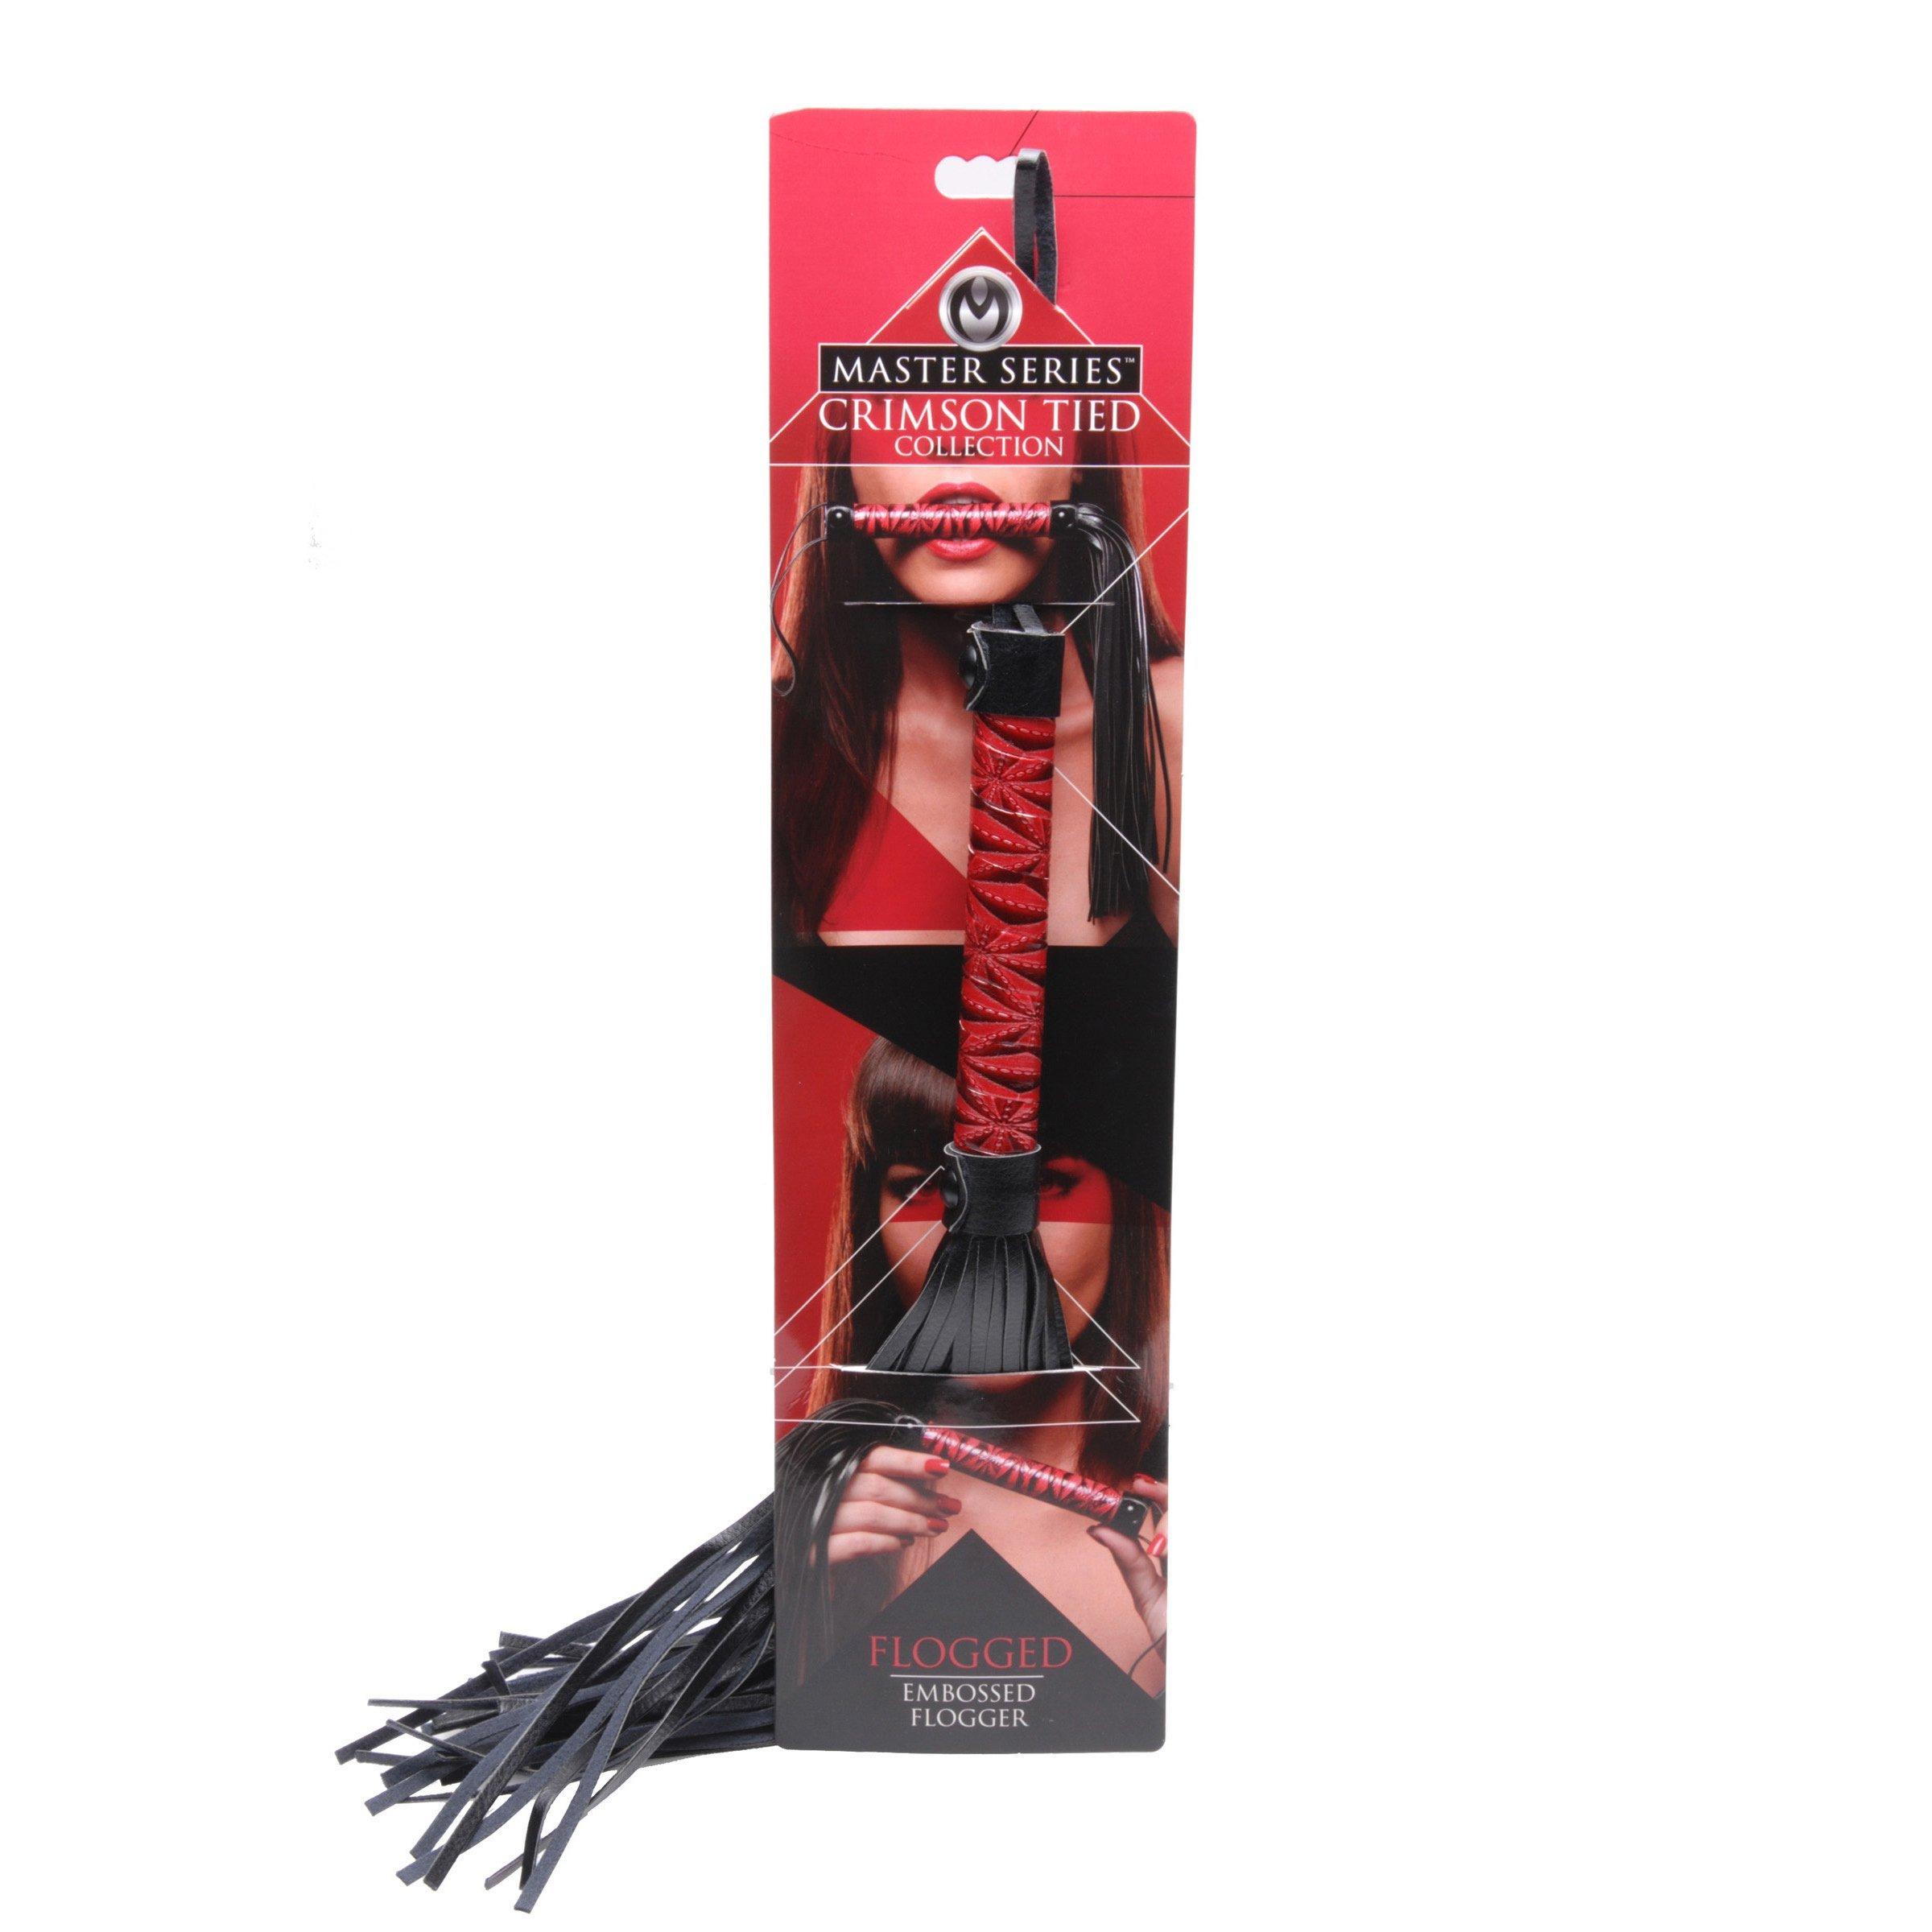 Crimson Tied Embossed Flogger